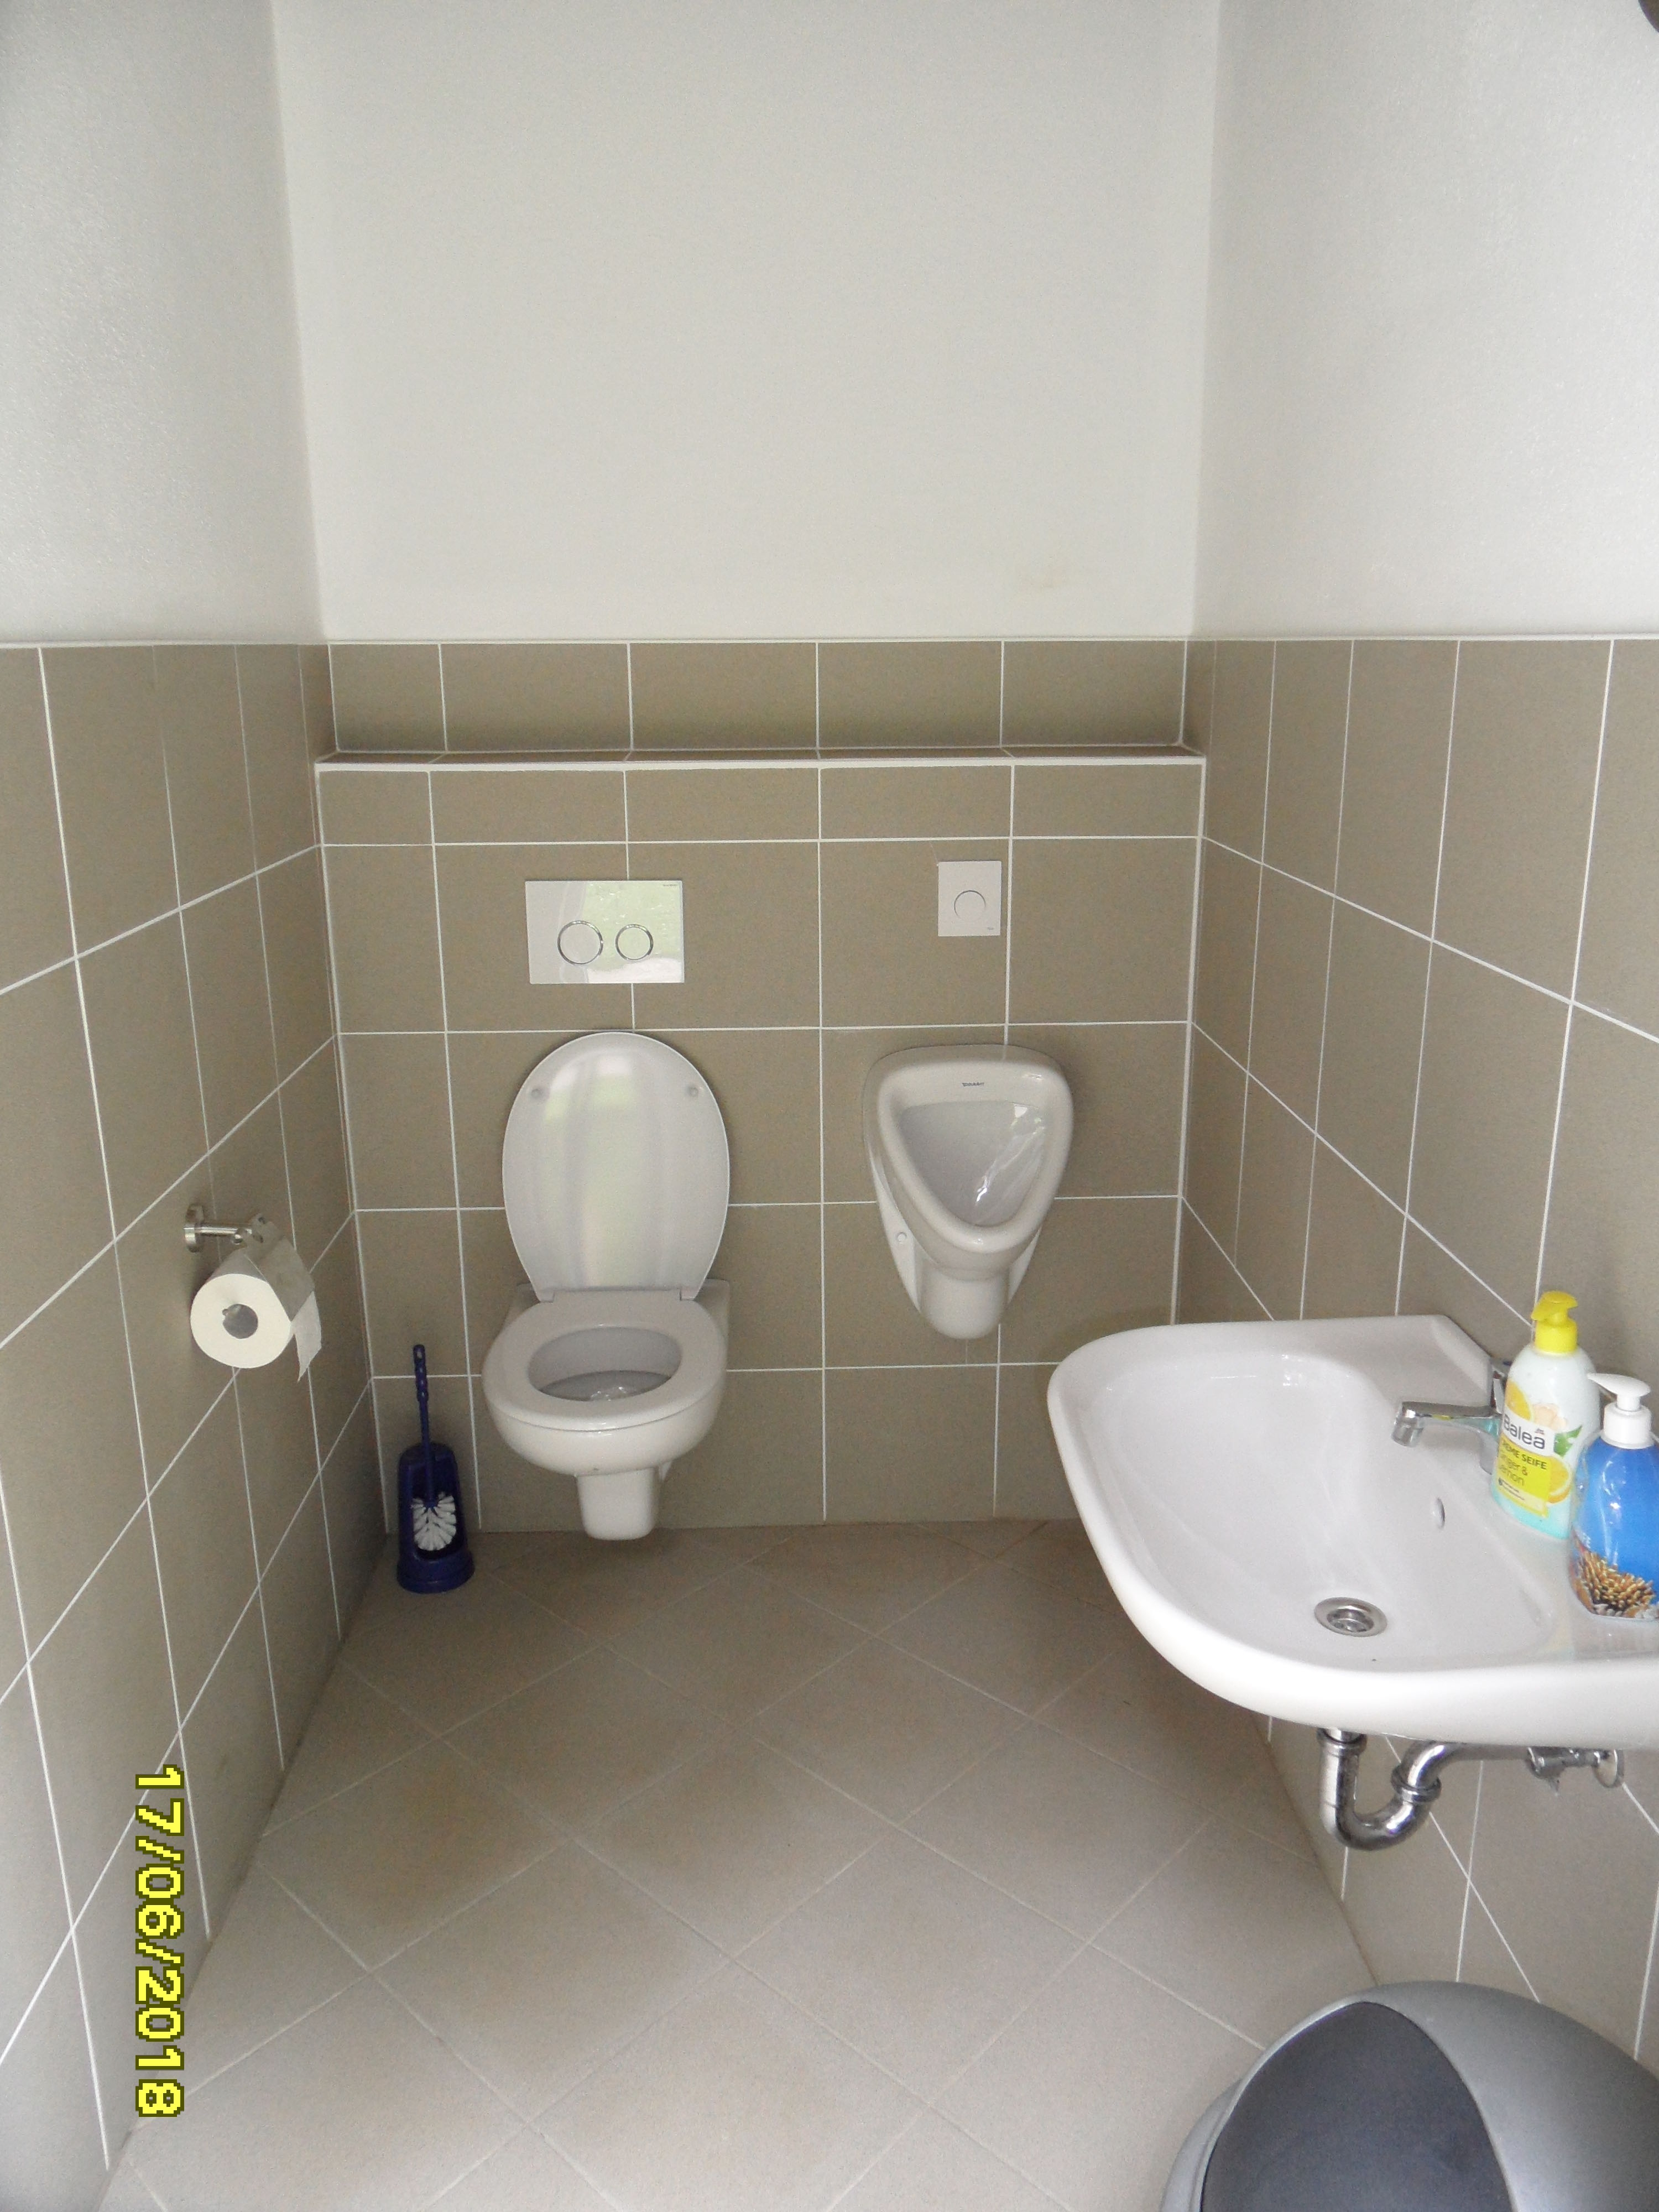 Grillhütte Toilette